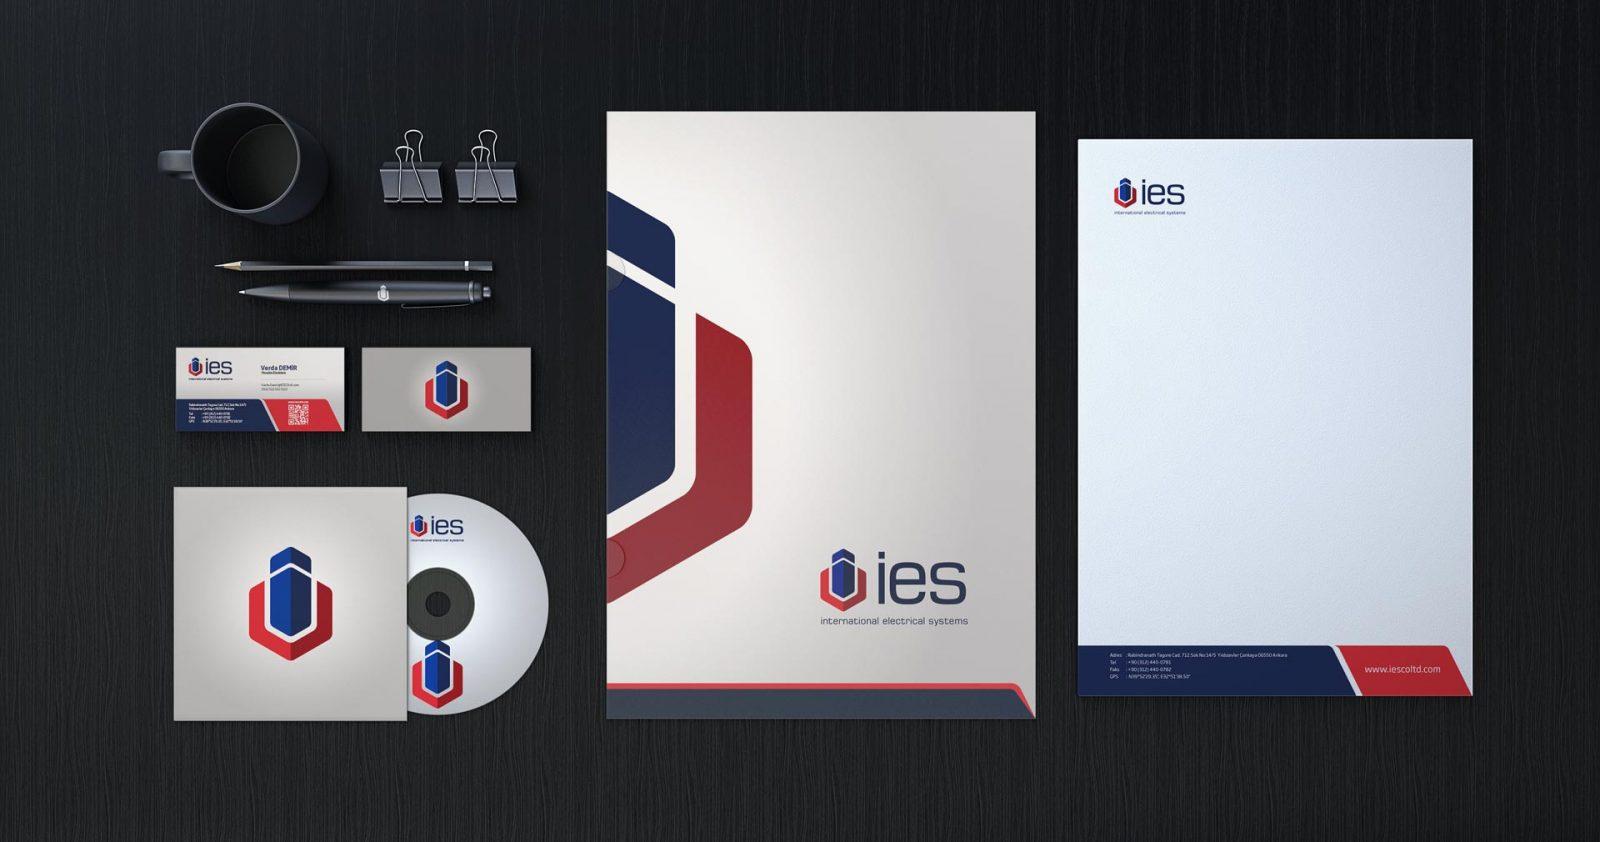 ies logo kurumsal kimlik tasarımı 03